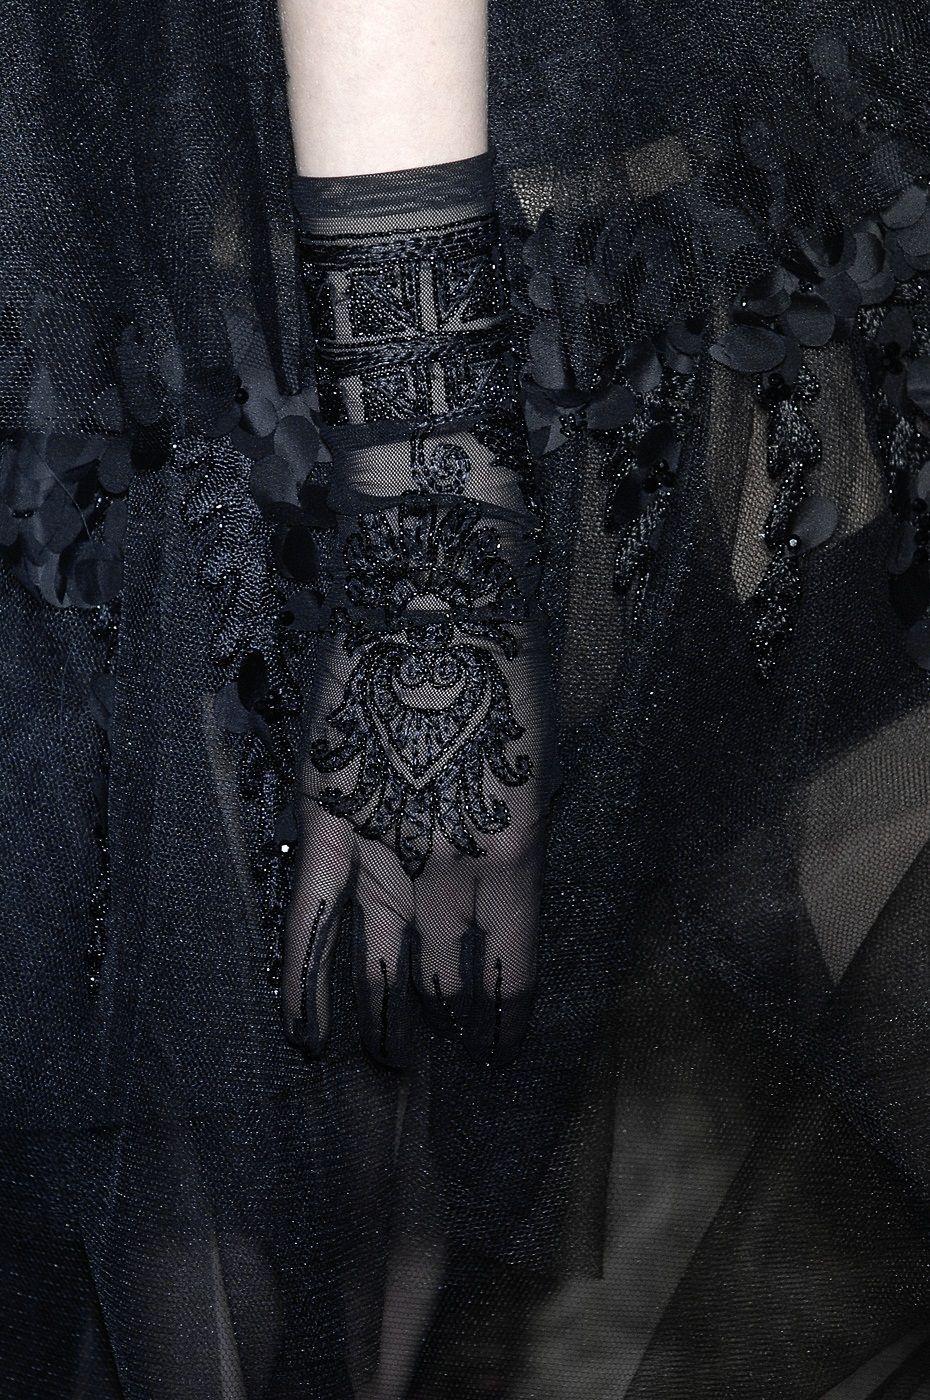 Evening-Gloves-1137